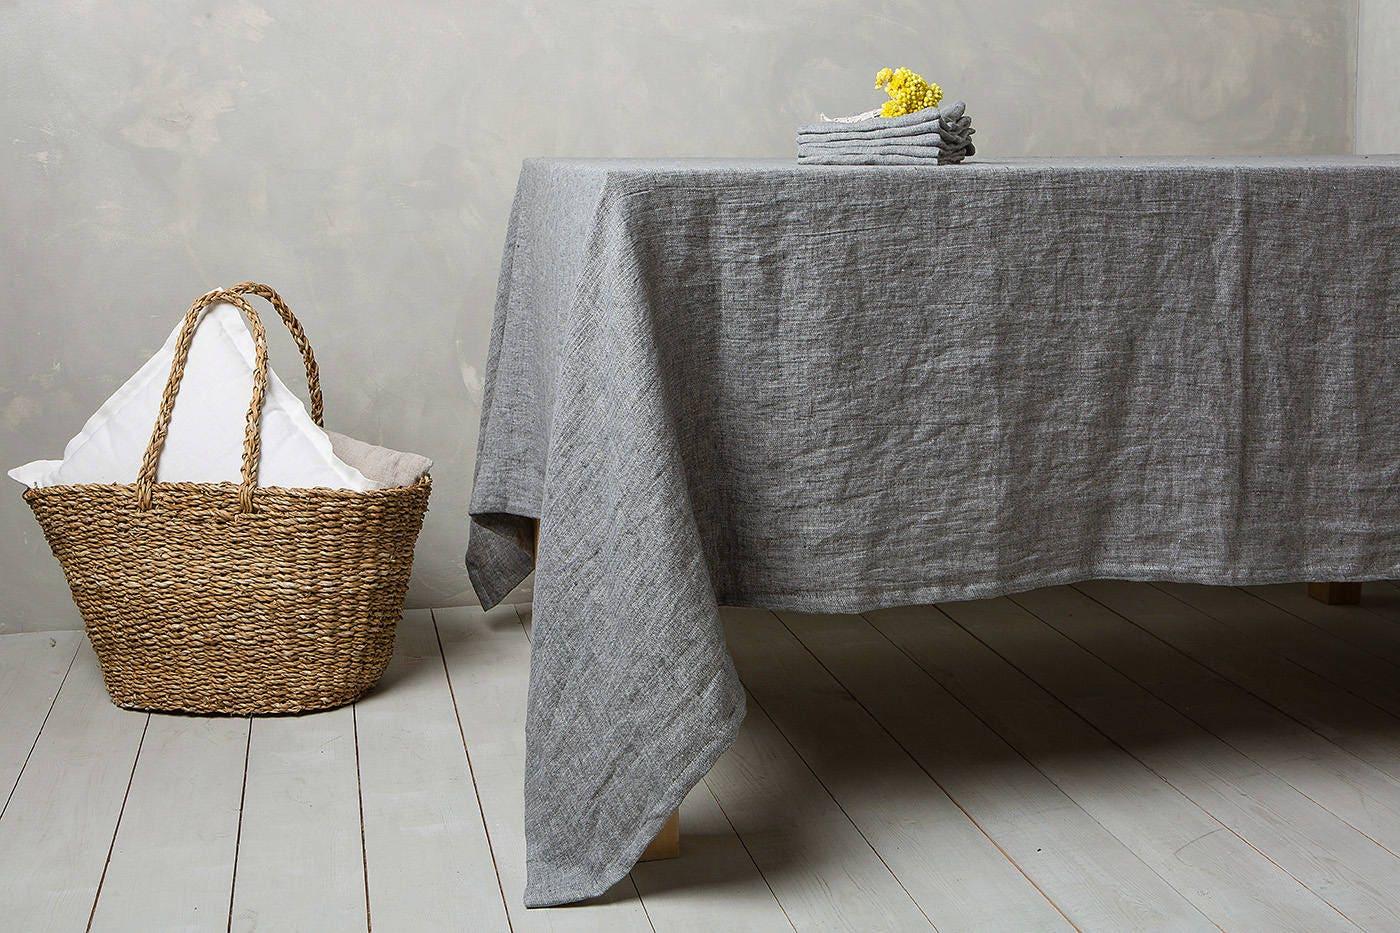 Delicieux Linen Tablecloth Linen Table Cloth In Graphite Table Linens Tablecloth Washed  Linen Tableloth.